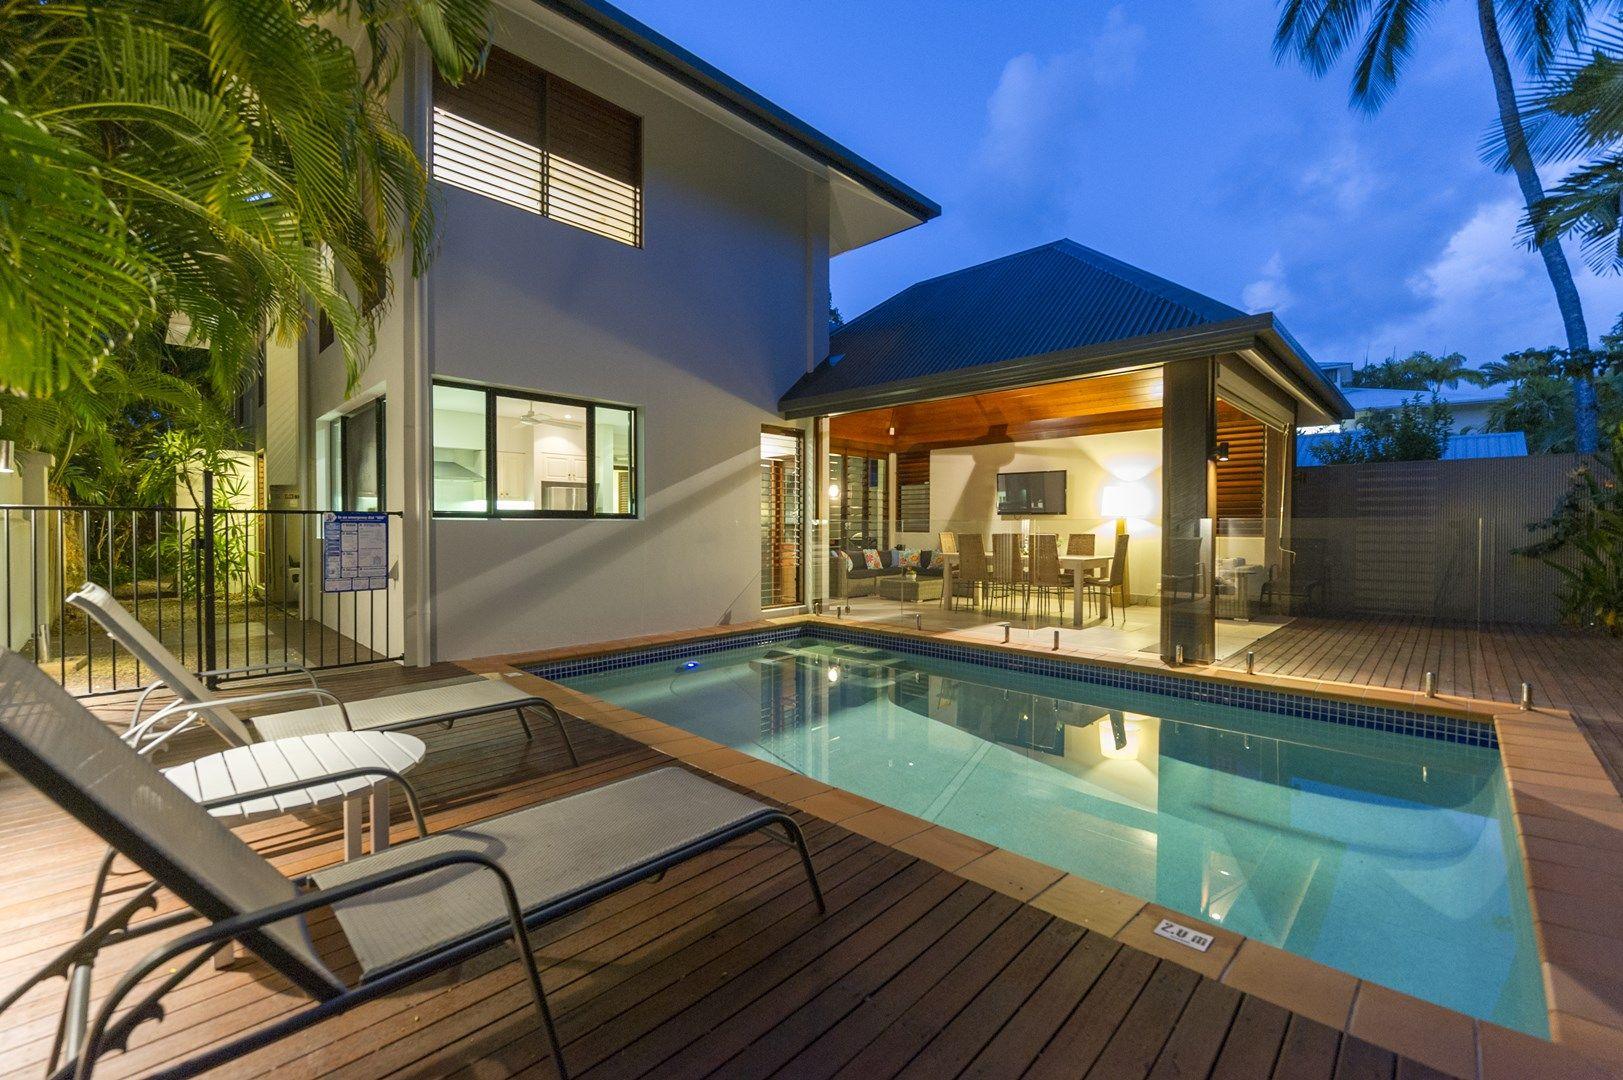 2/42 Garrick Street, Port Douglas QLD 4877, Image 0